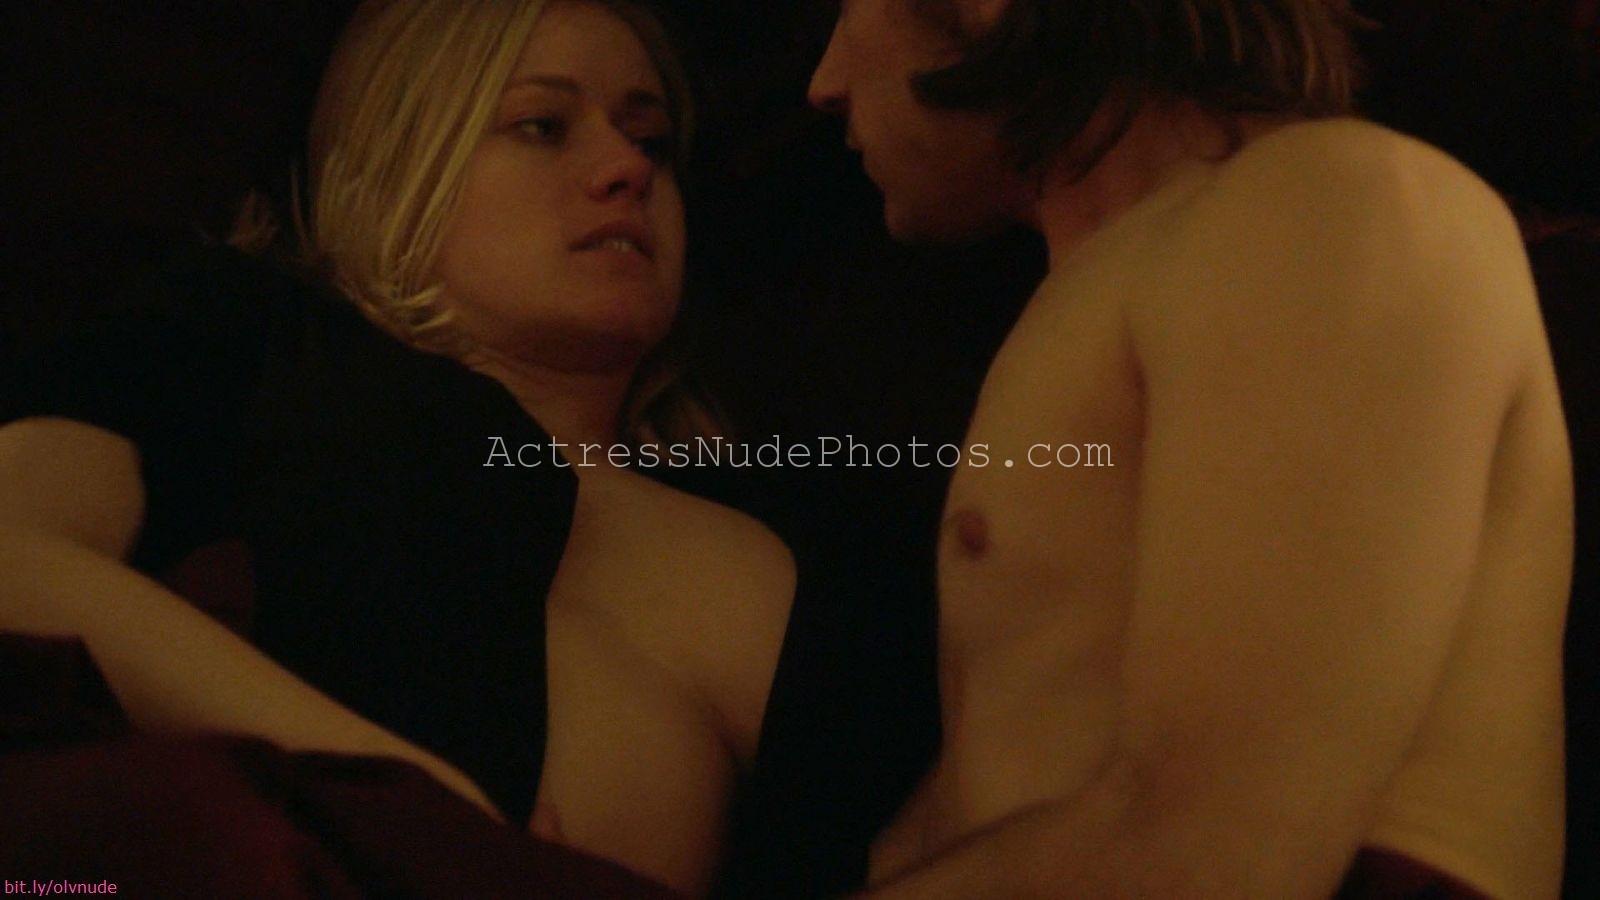 Dudley olivia boobs taylor Olivia Taylor